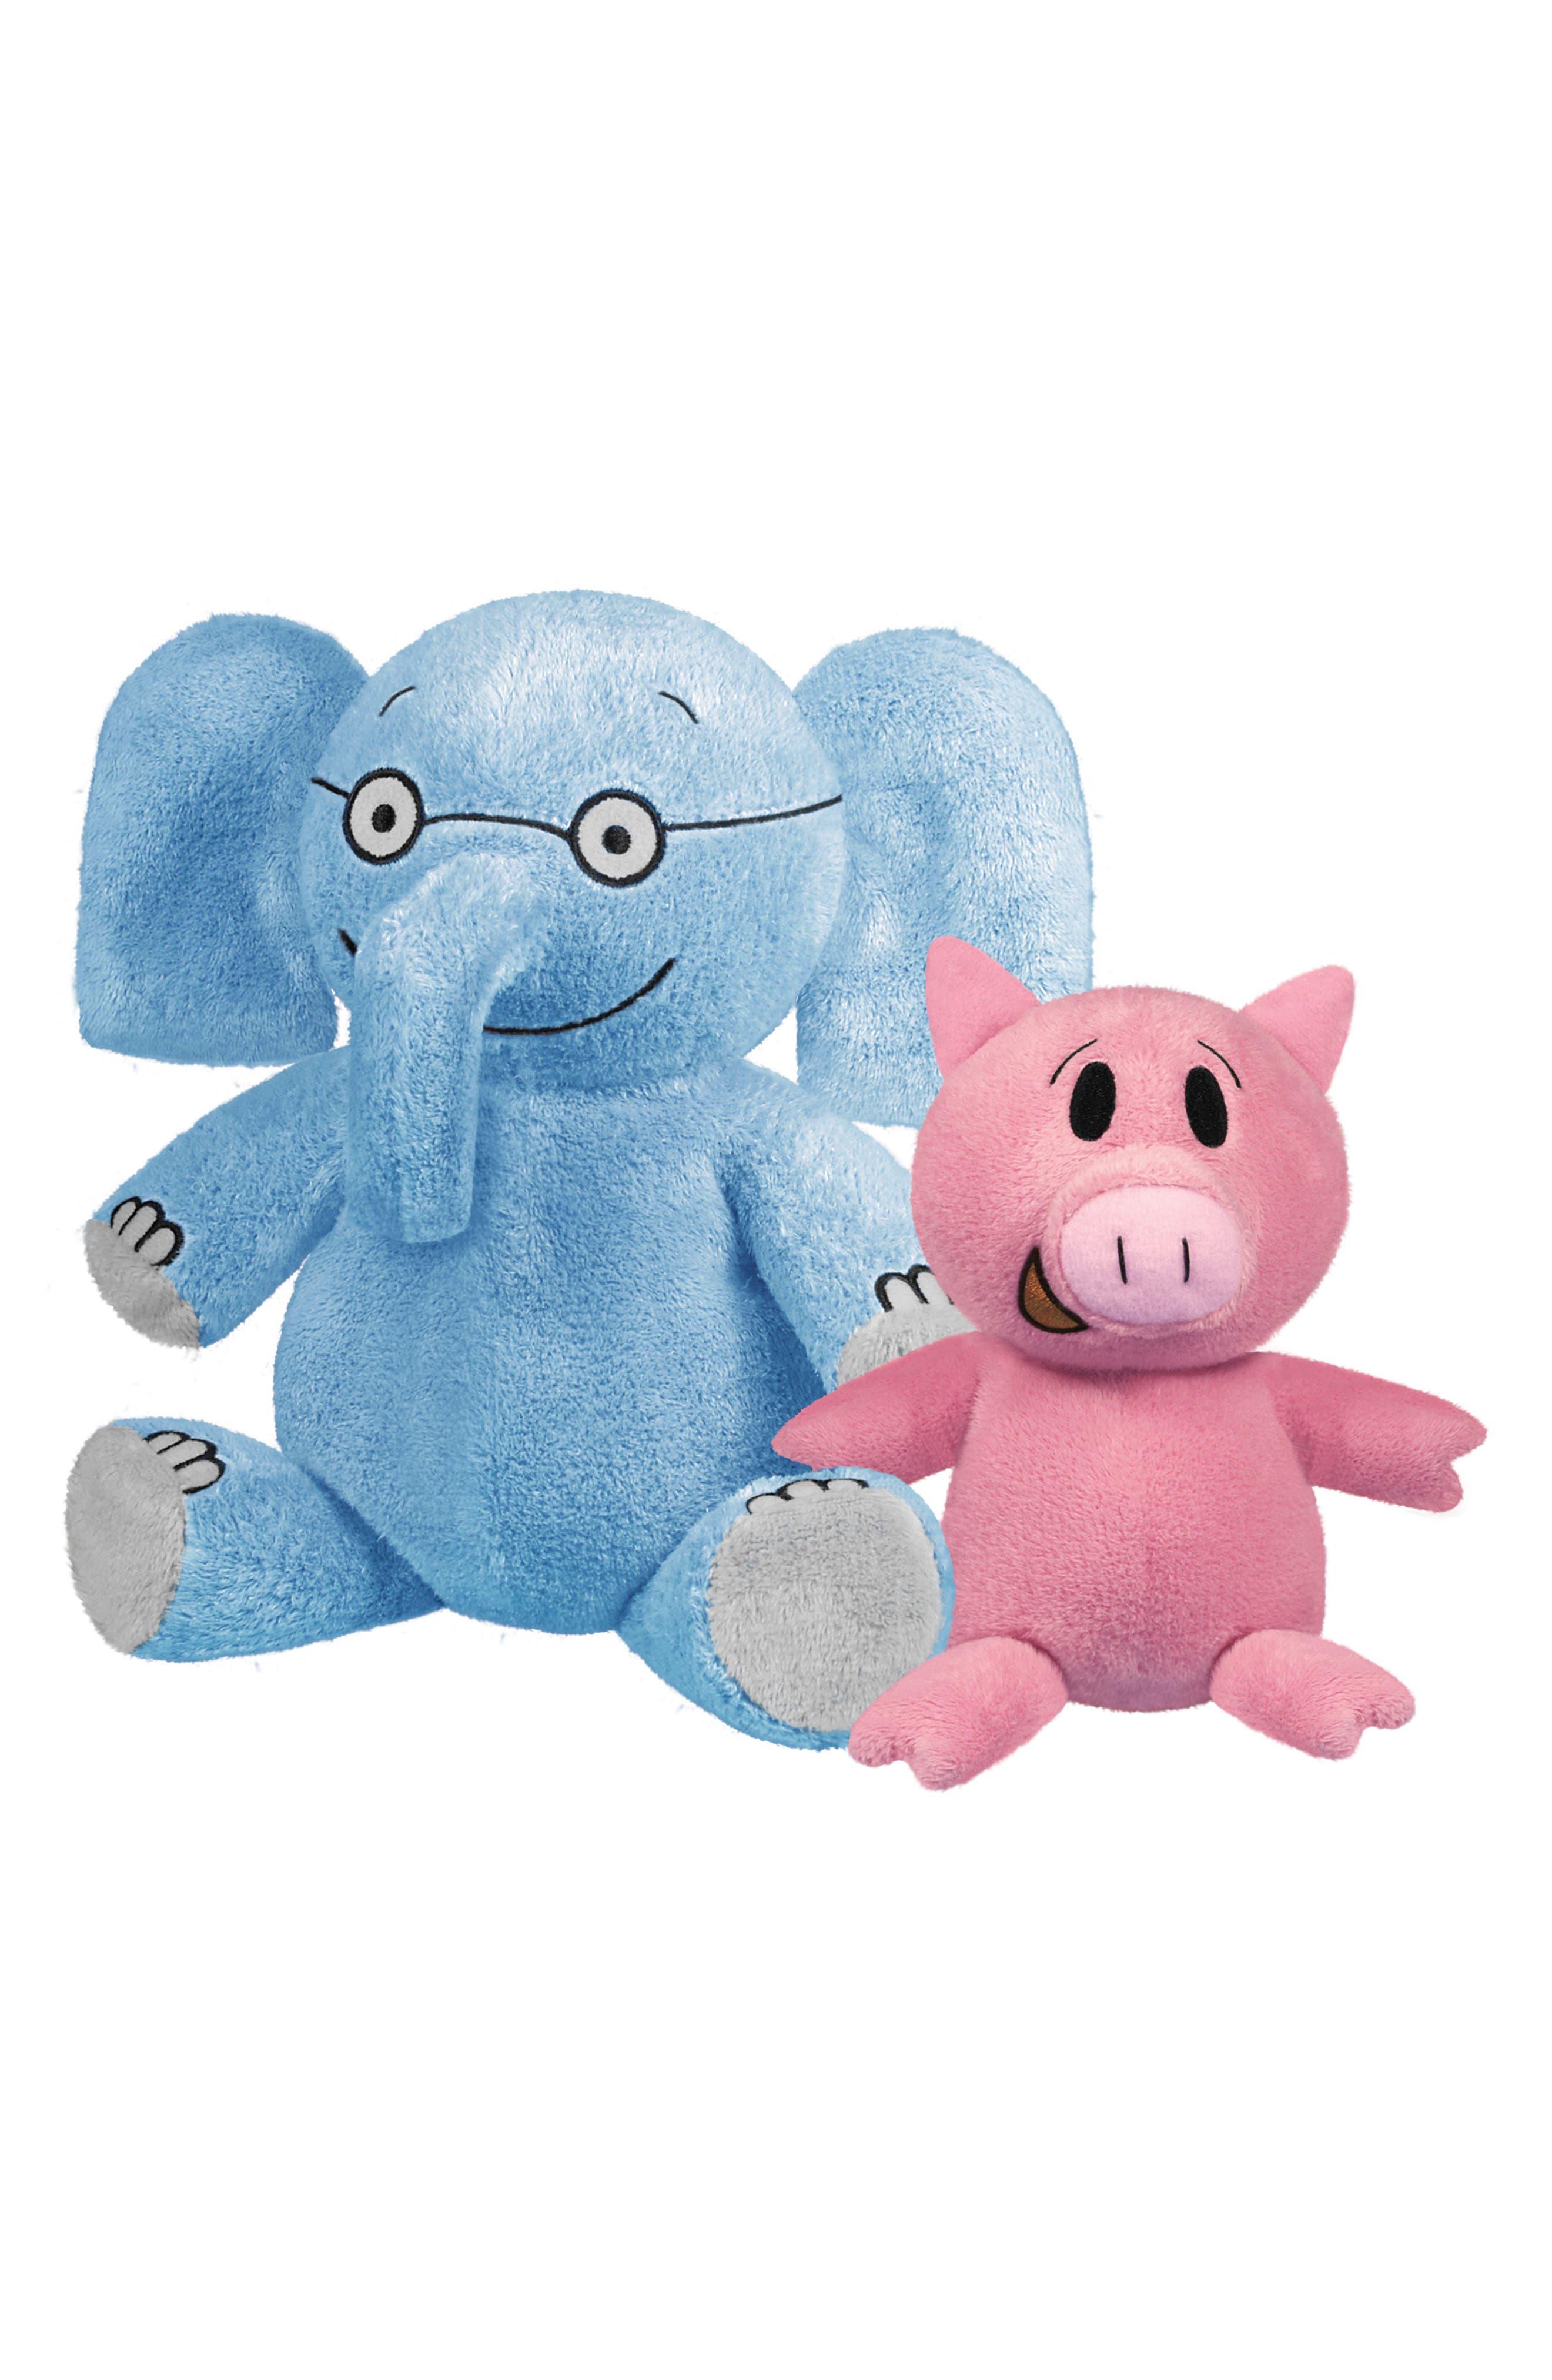 yOttOy Two-Piece Elephant and Piggie Stuffed Animal Set